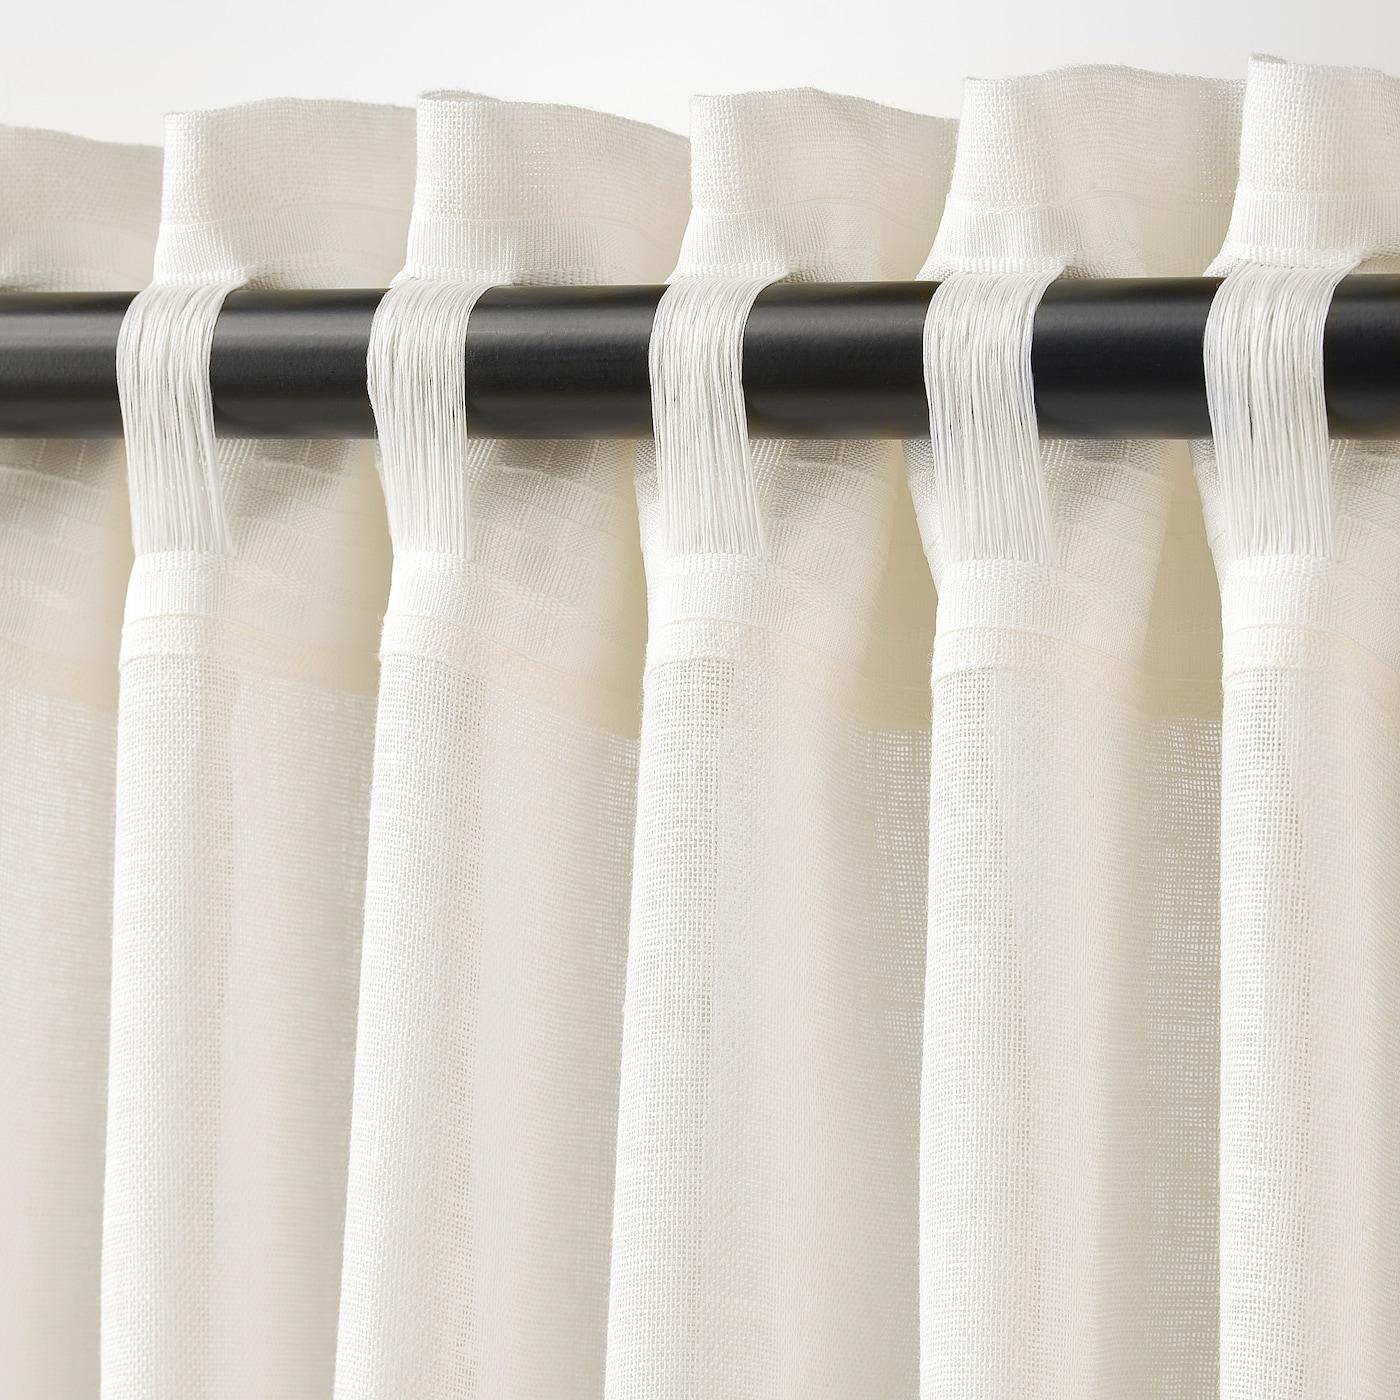 Lejongap Curtains 1 Pair White 57x98